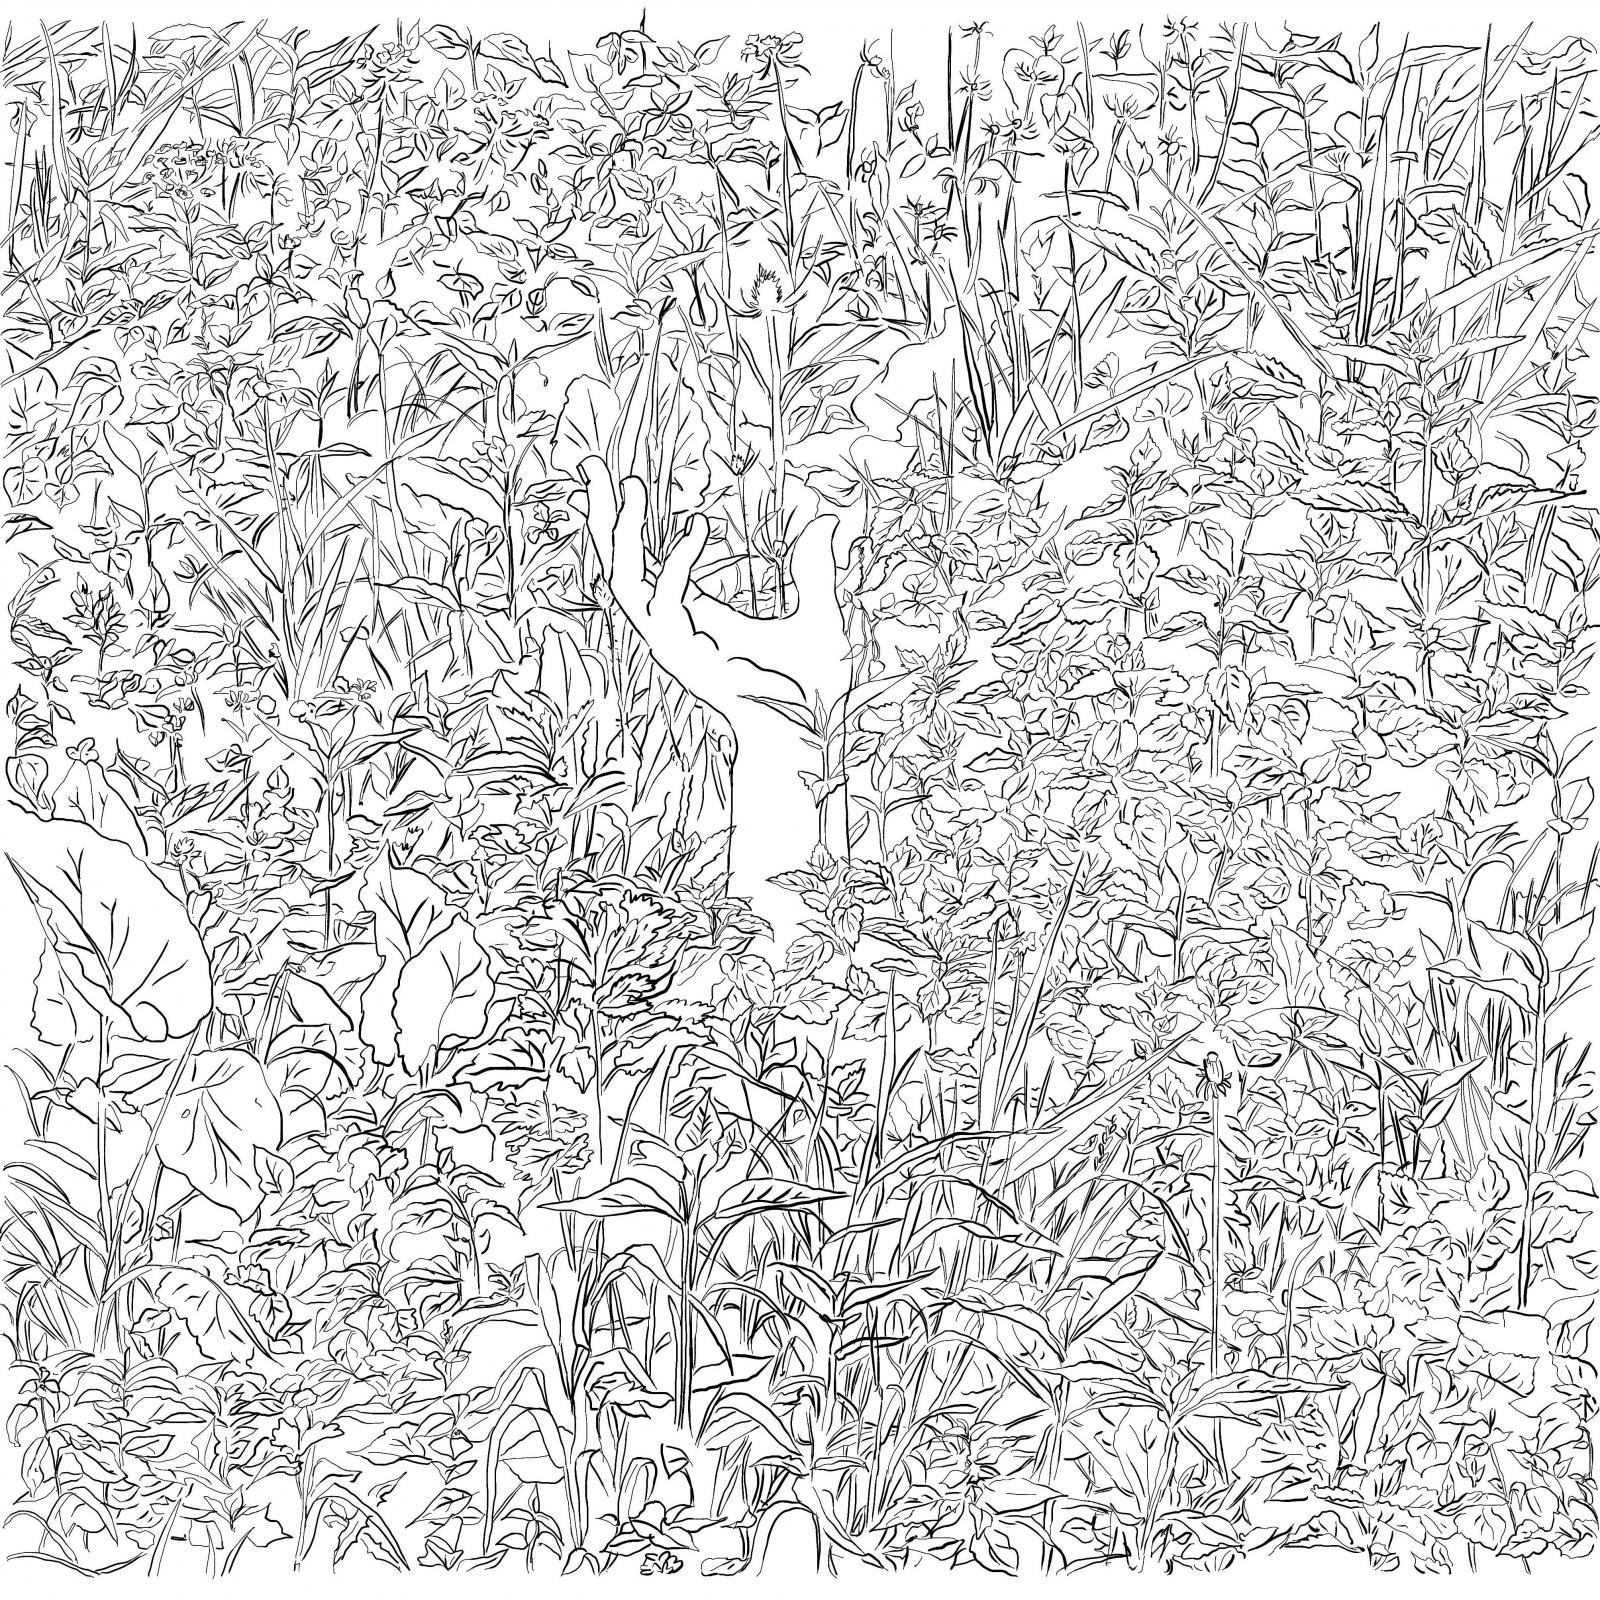 SuperSam+1, 2016 - rysunek